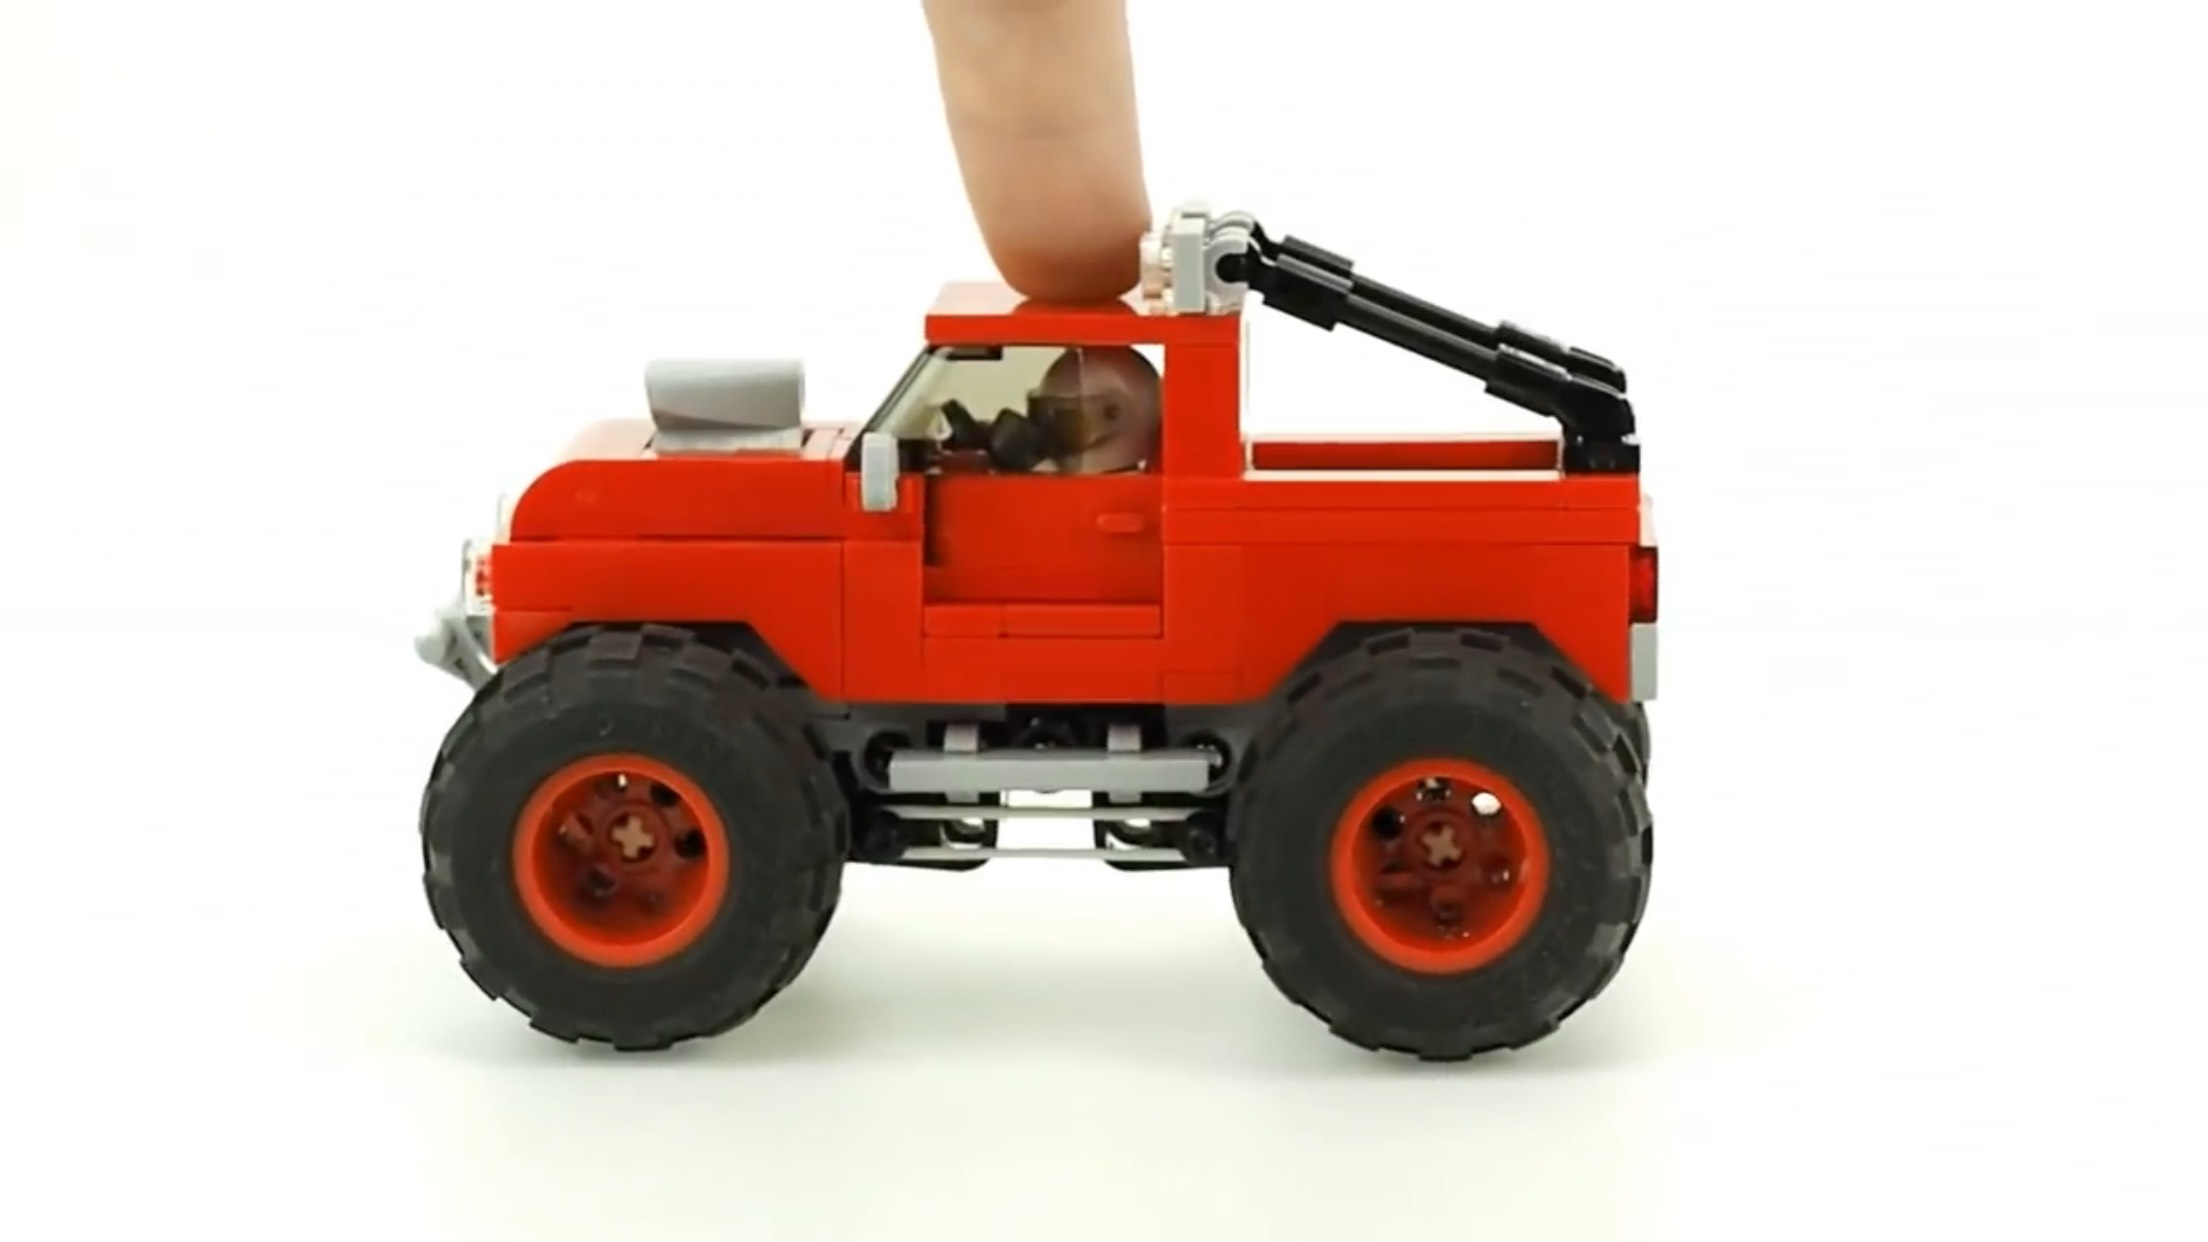 technic-moc-11092-monster-truck-by-de_marco-moc-brick-land